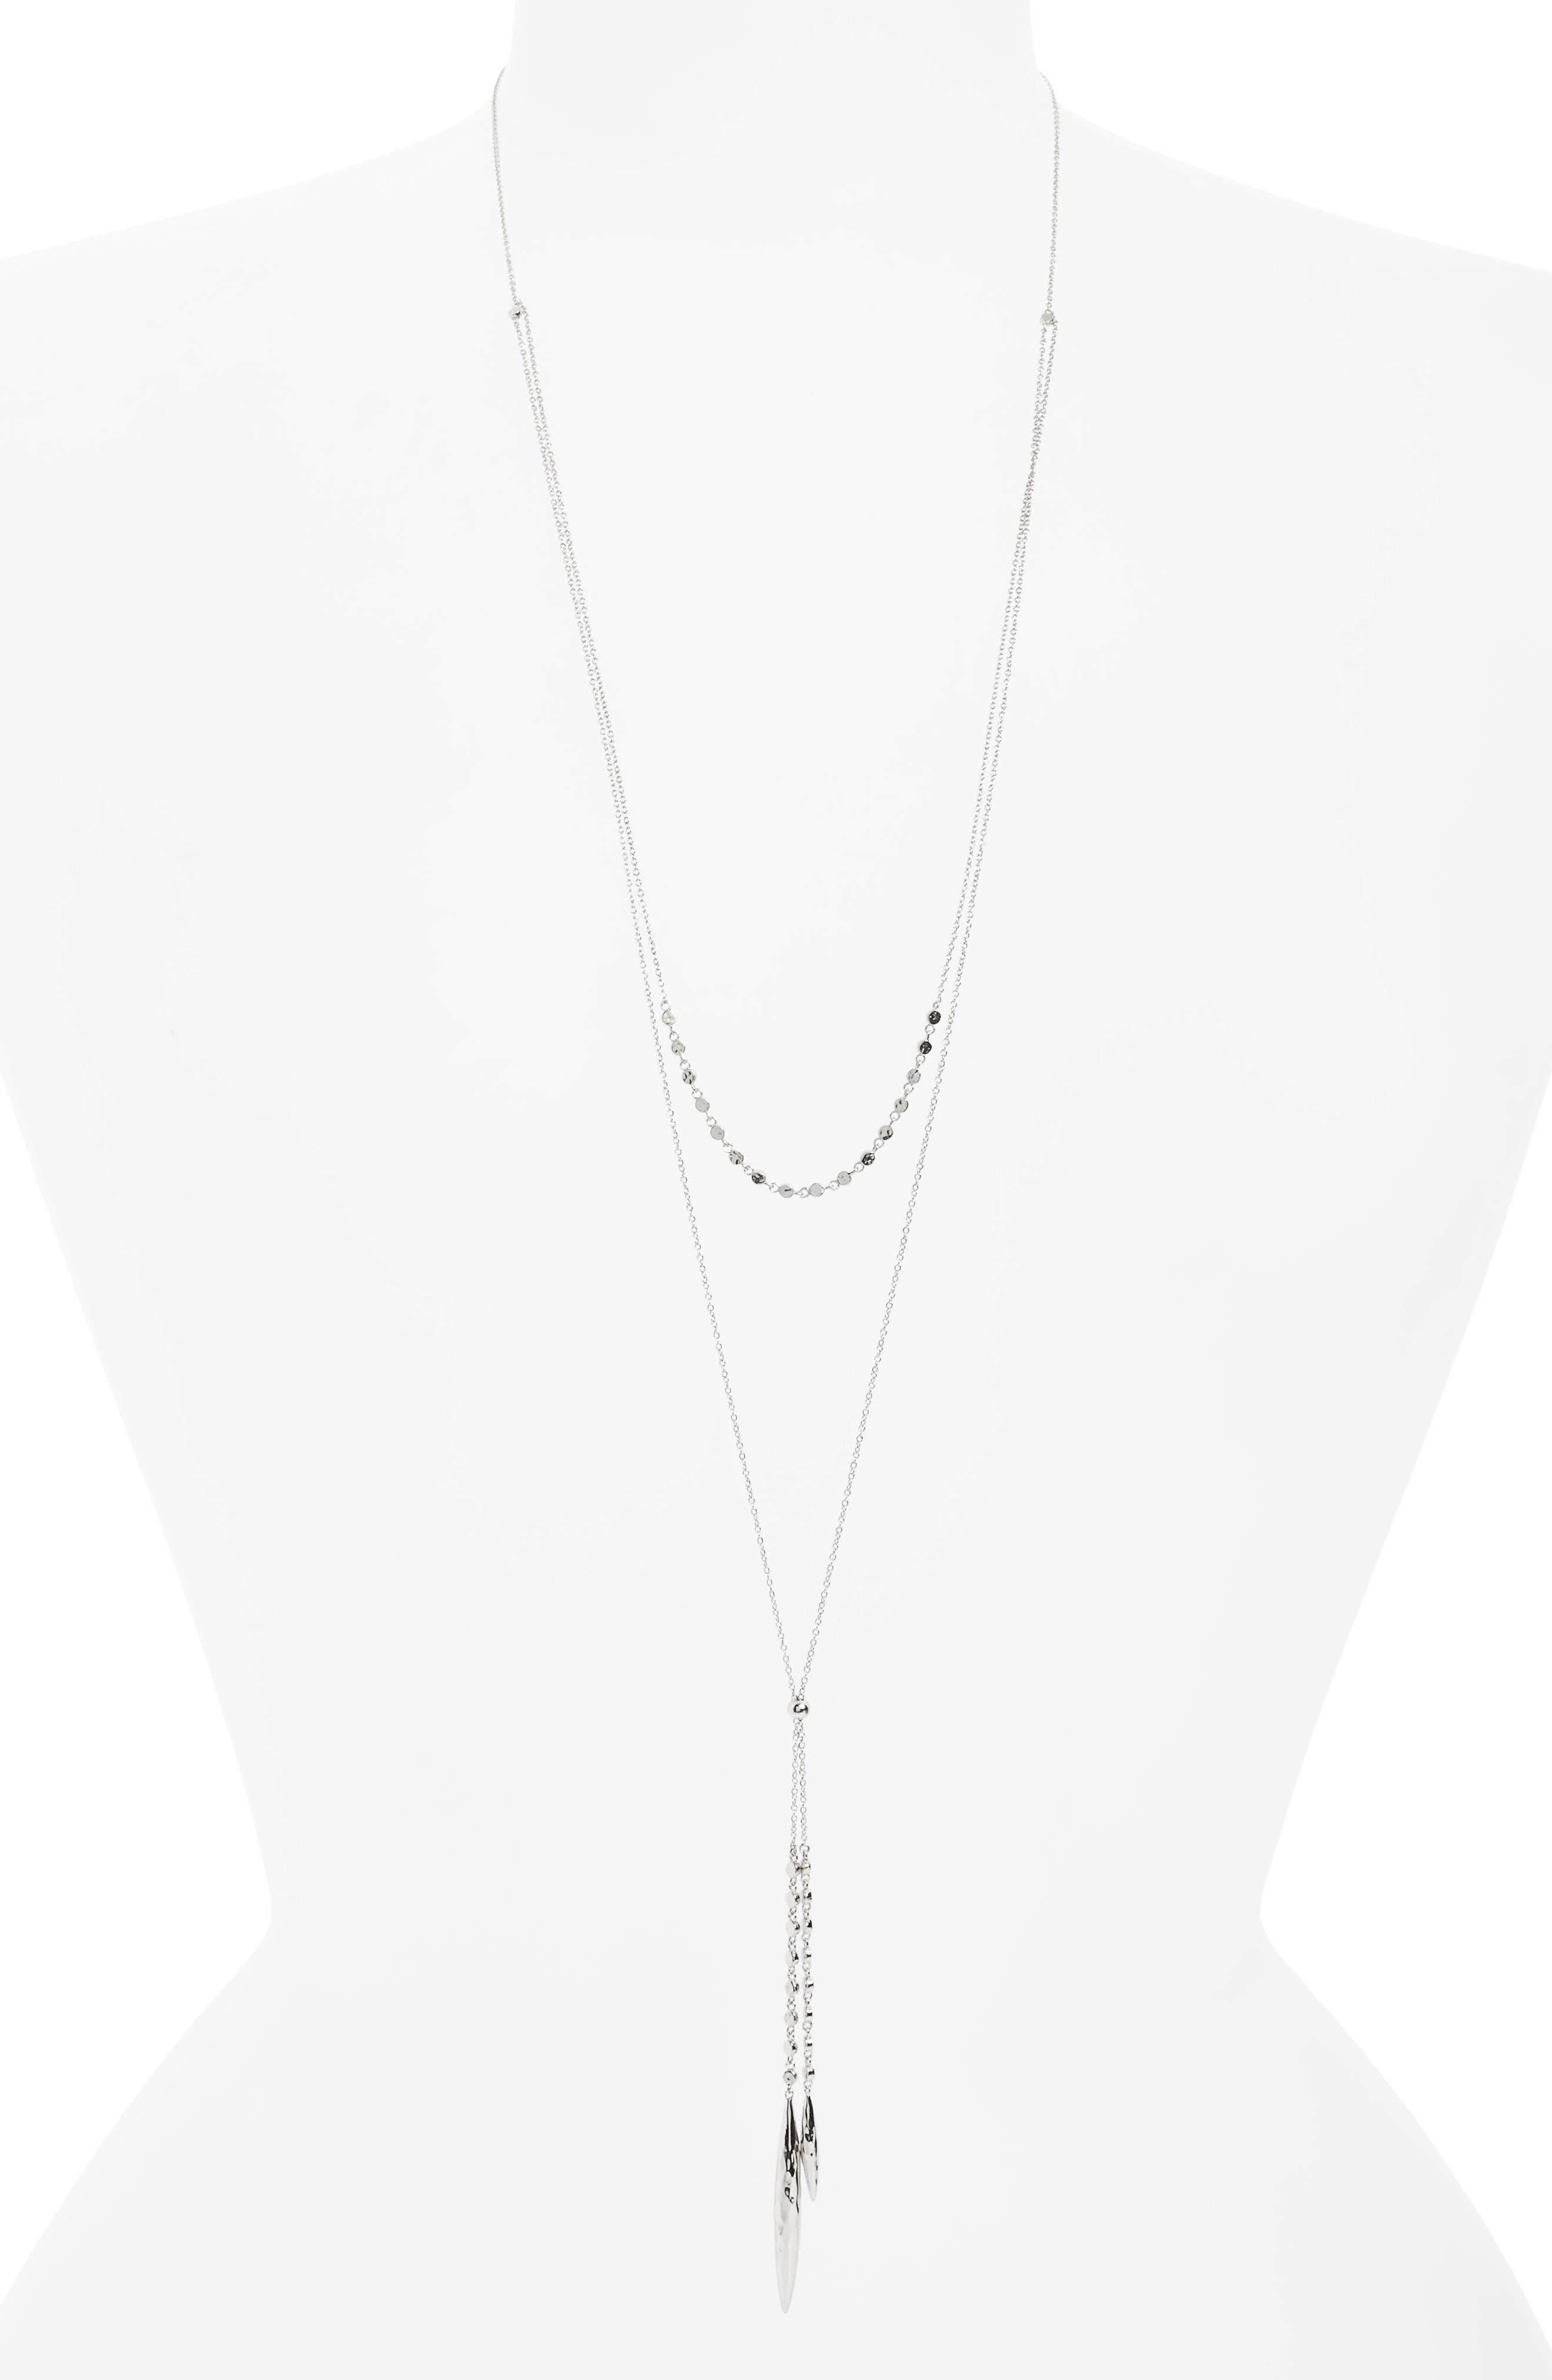 Chloe Multistrand Necklace,                         Main,                         color, 049